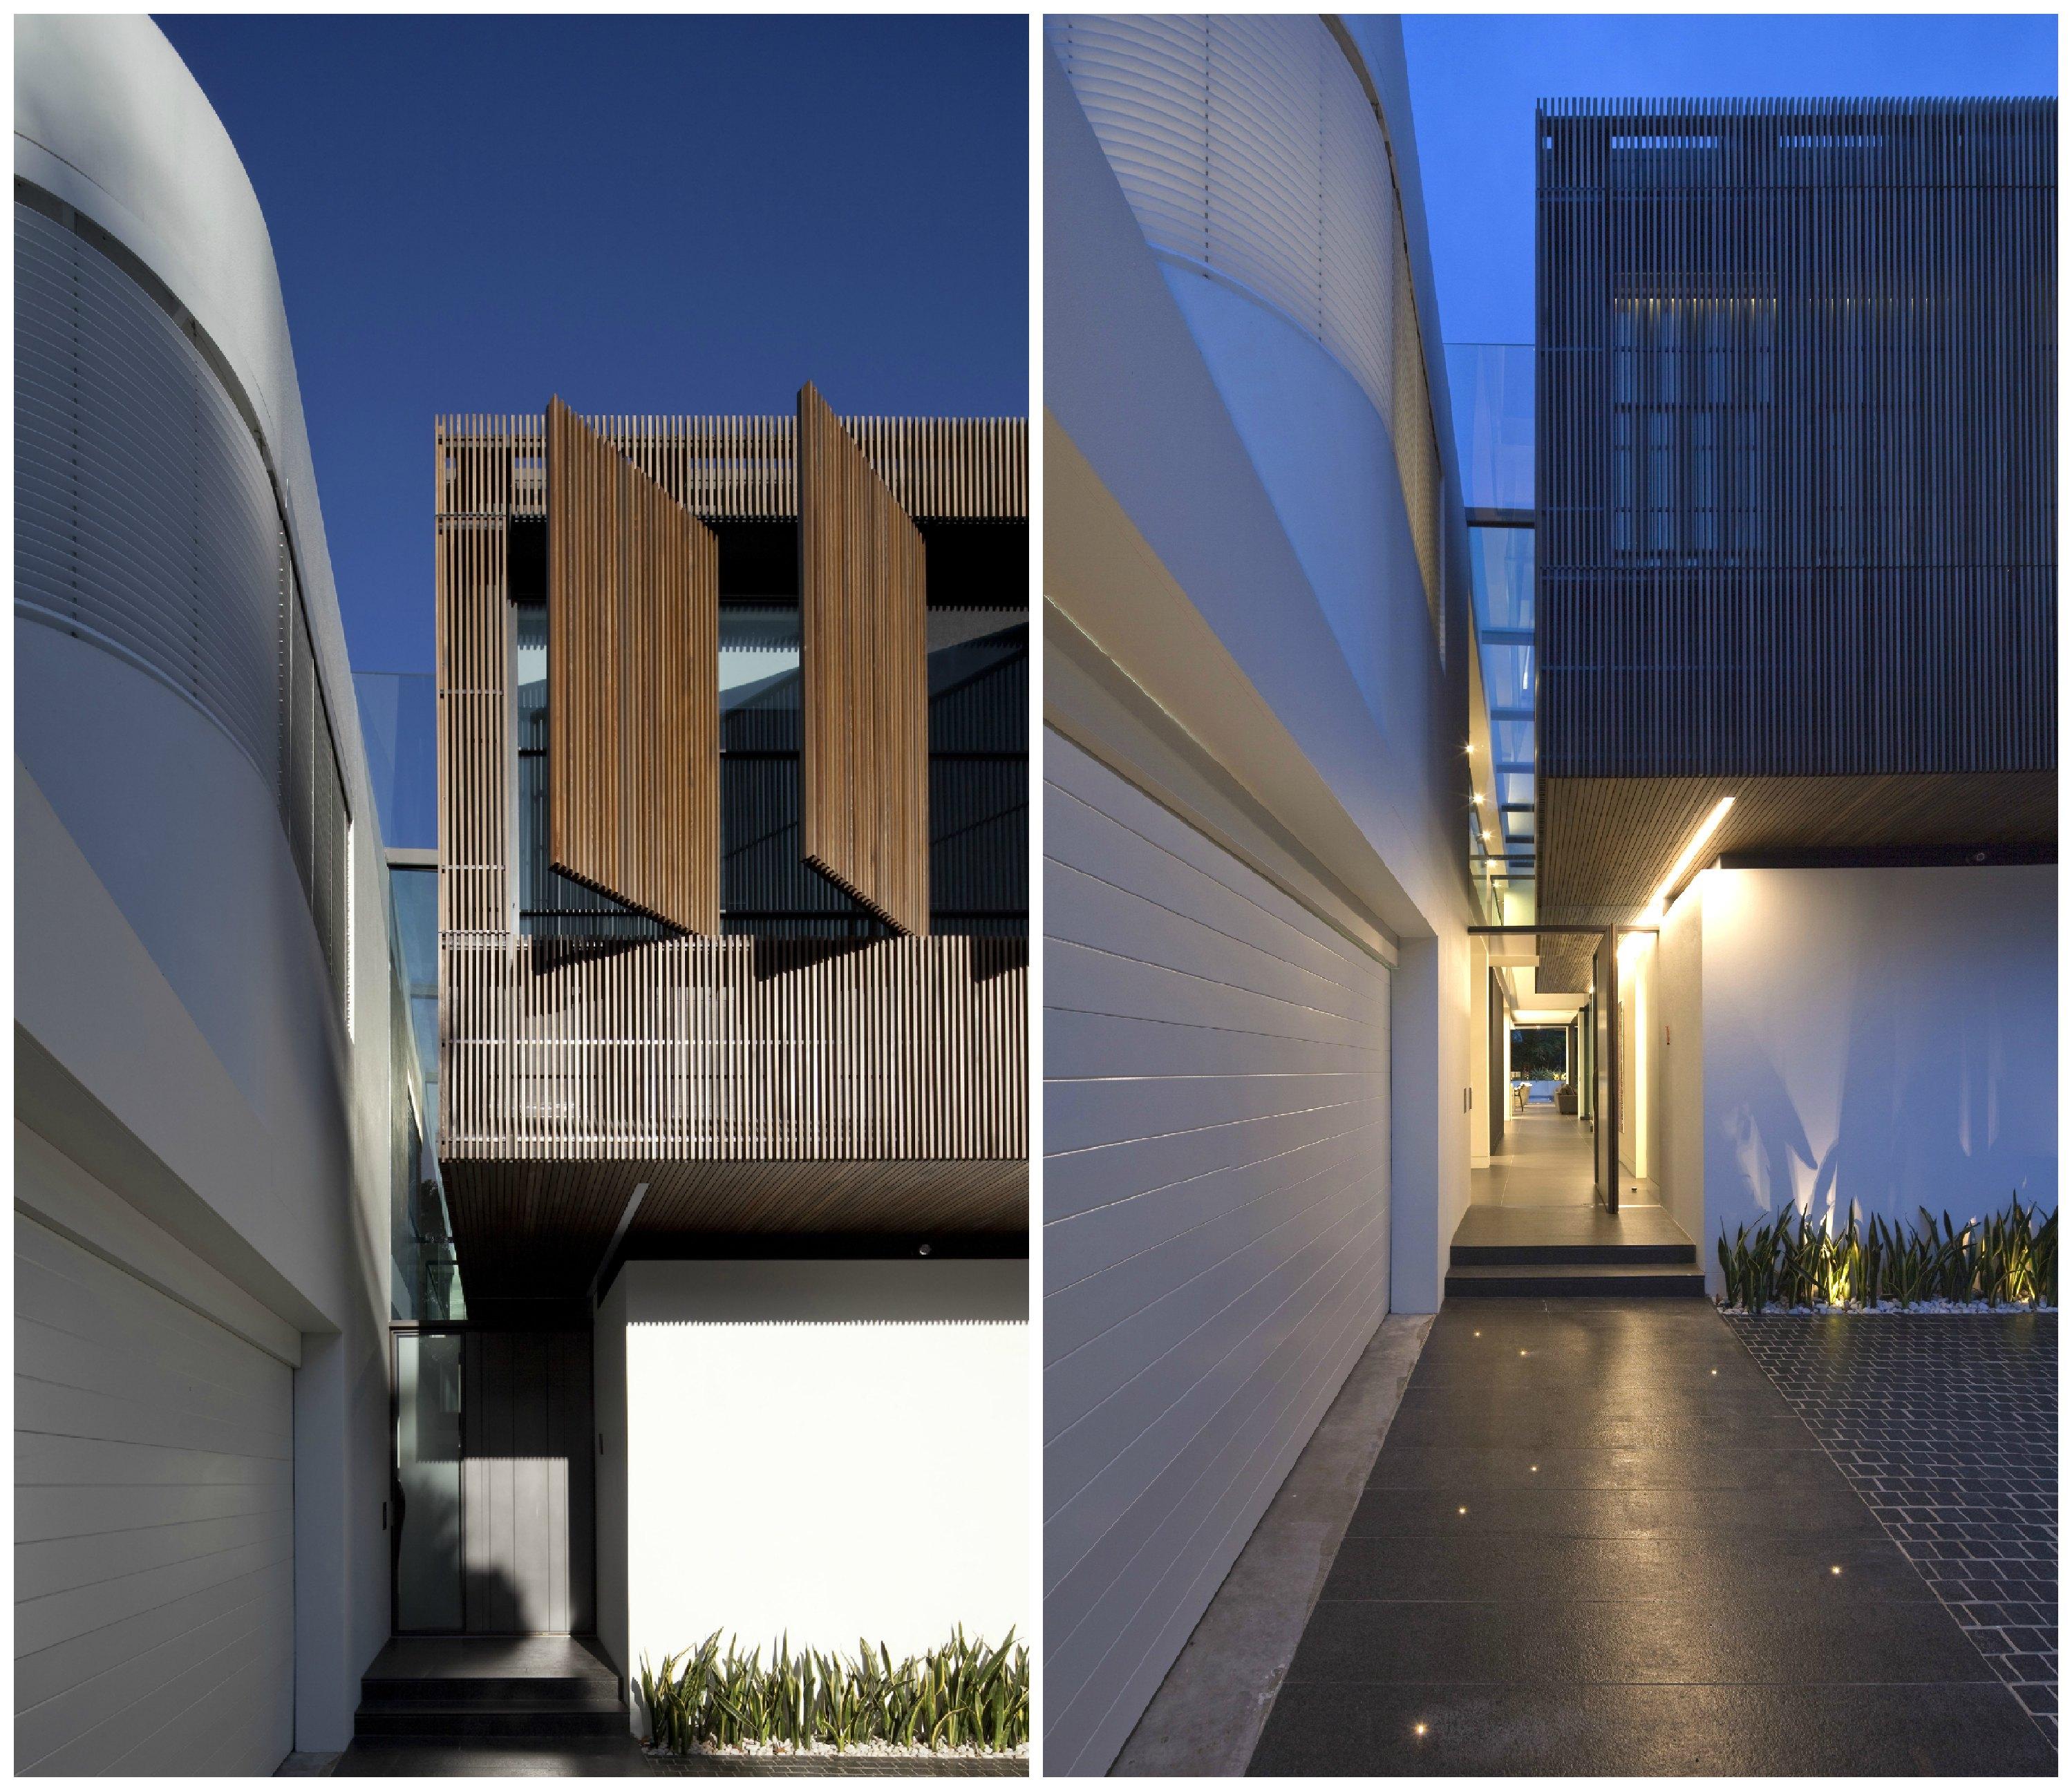 Curved Architecture Curved Concrete Architecture